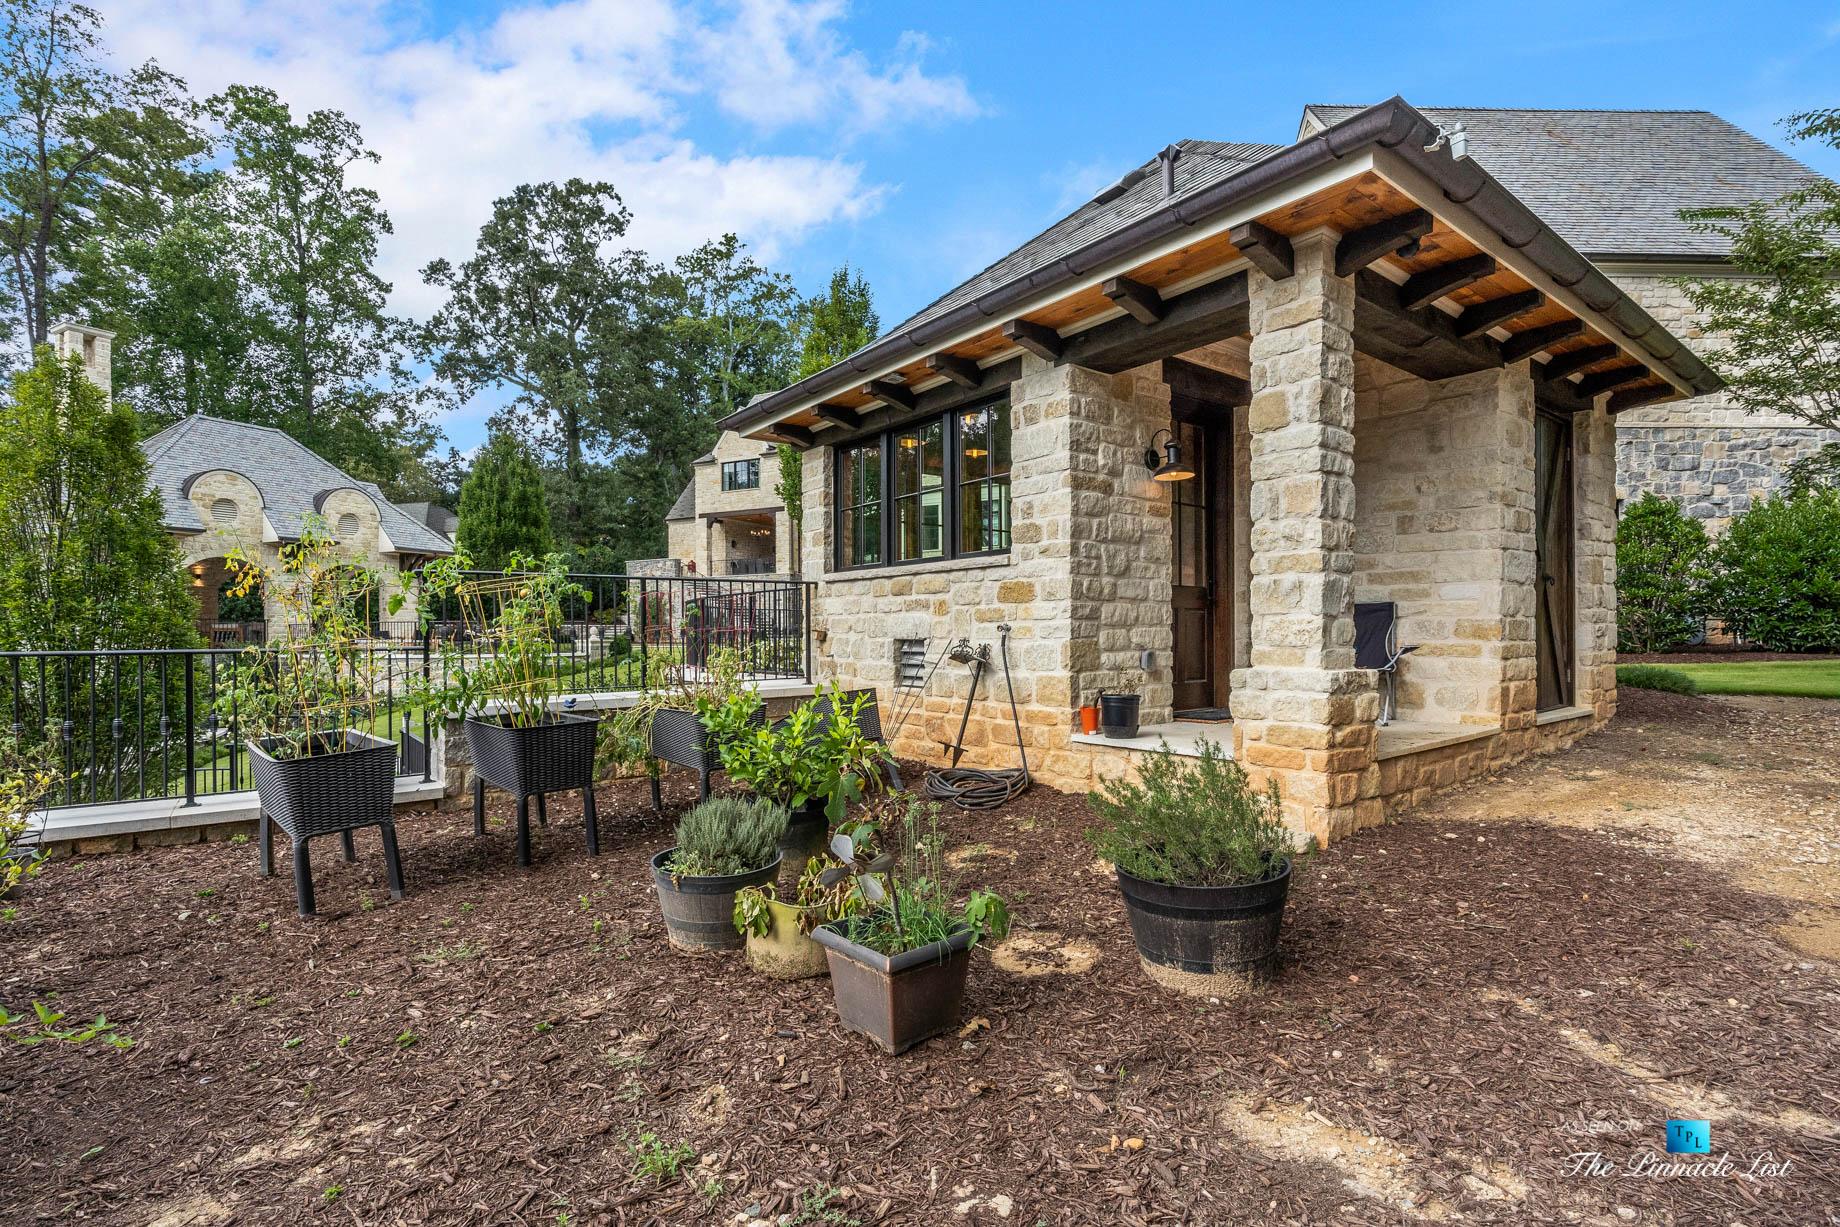 1150 W Garmon Rd, Atlanta, GA, USA – Luxury Garden Shed – Luxury Real Estate – Buckhead Estate Home